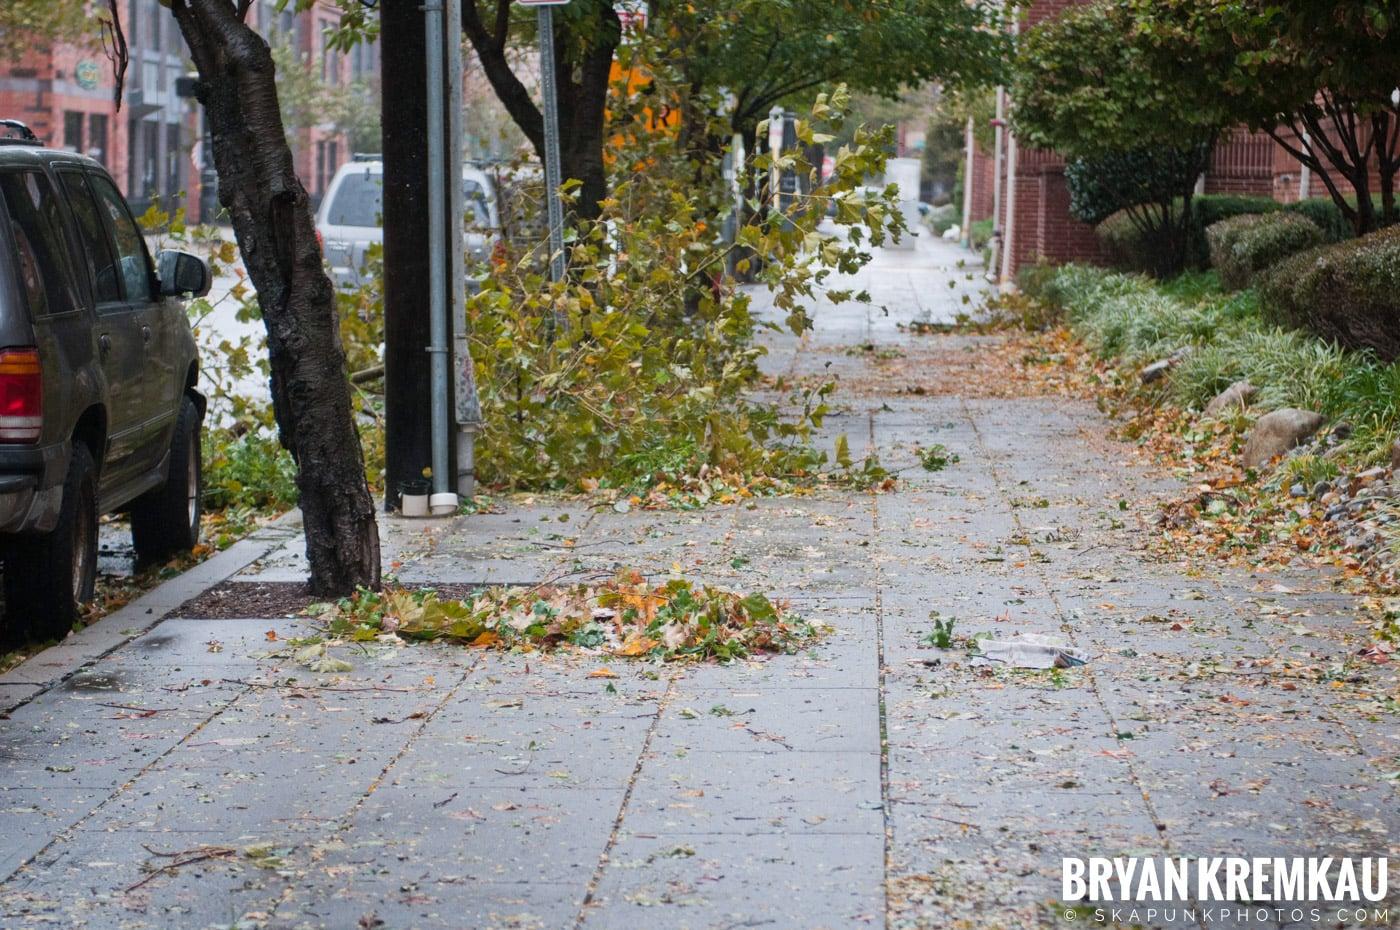 Hurricane Sandy 2012 @ Paulus Hook, Jersey City - 10.29.12 - 10.30.12 (37)